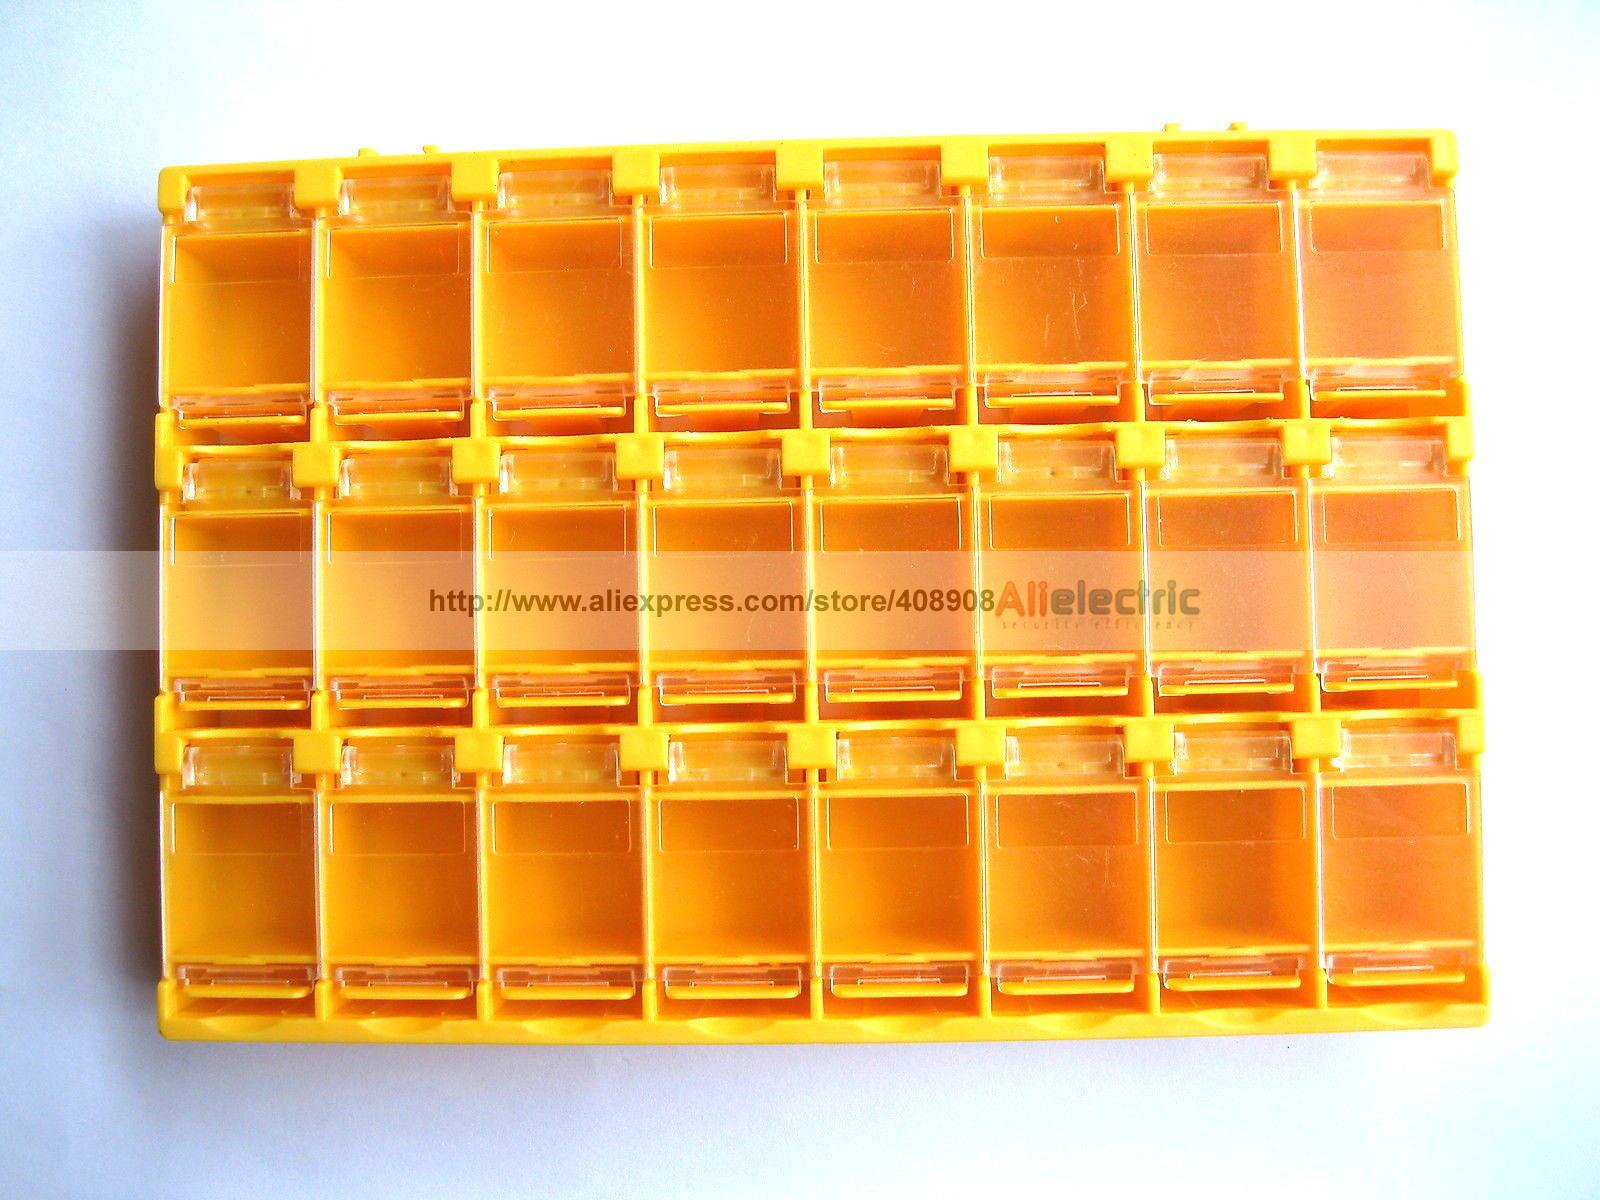 2 Pcs SMT Electronic Component Mini Storage Box 24 Grid Orange T156 lodestar electronic component box 8 section